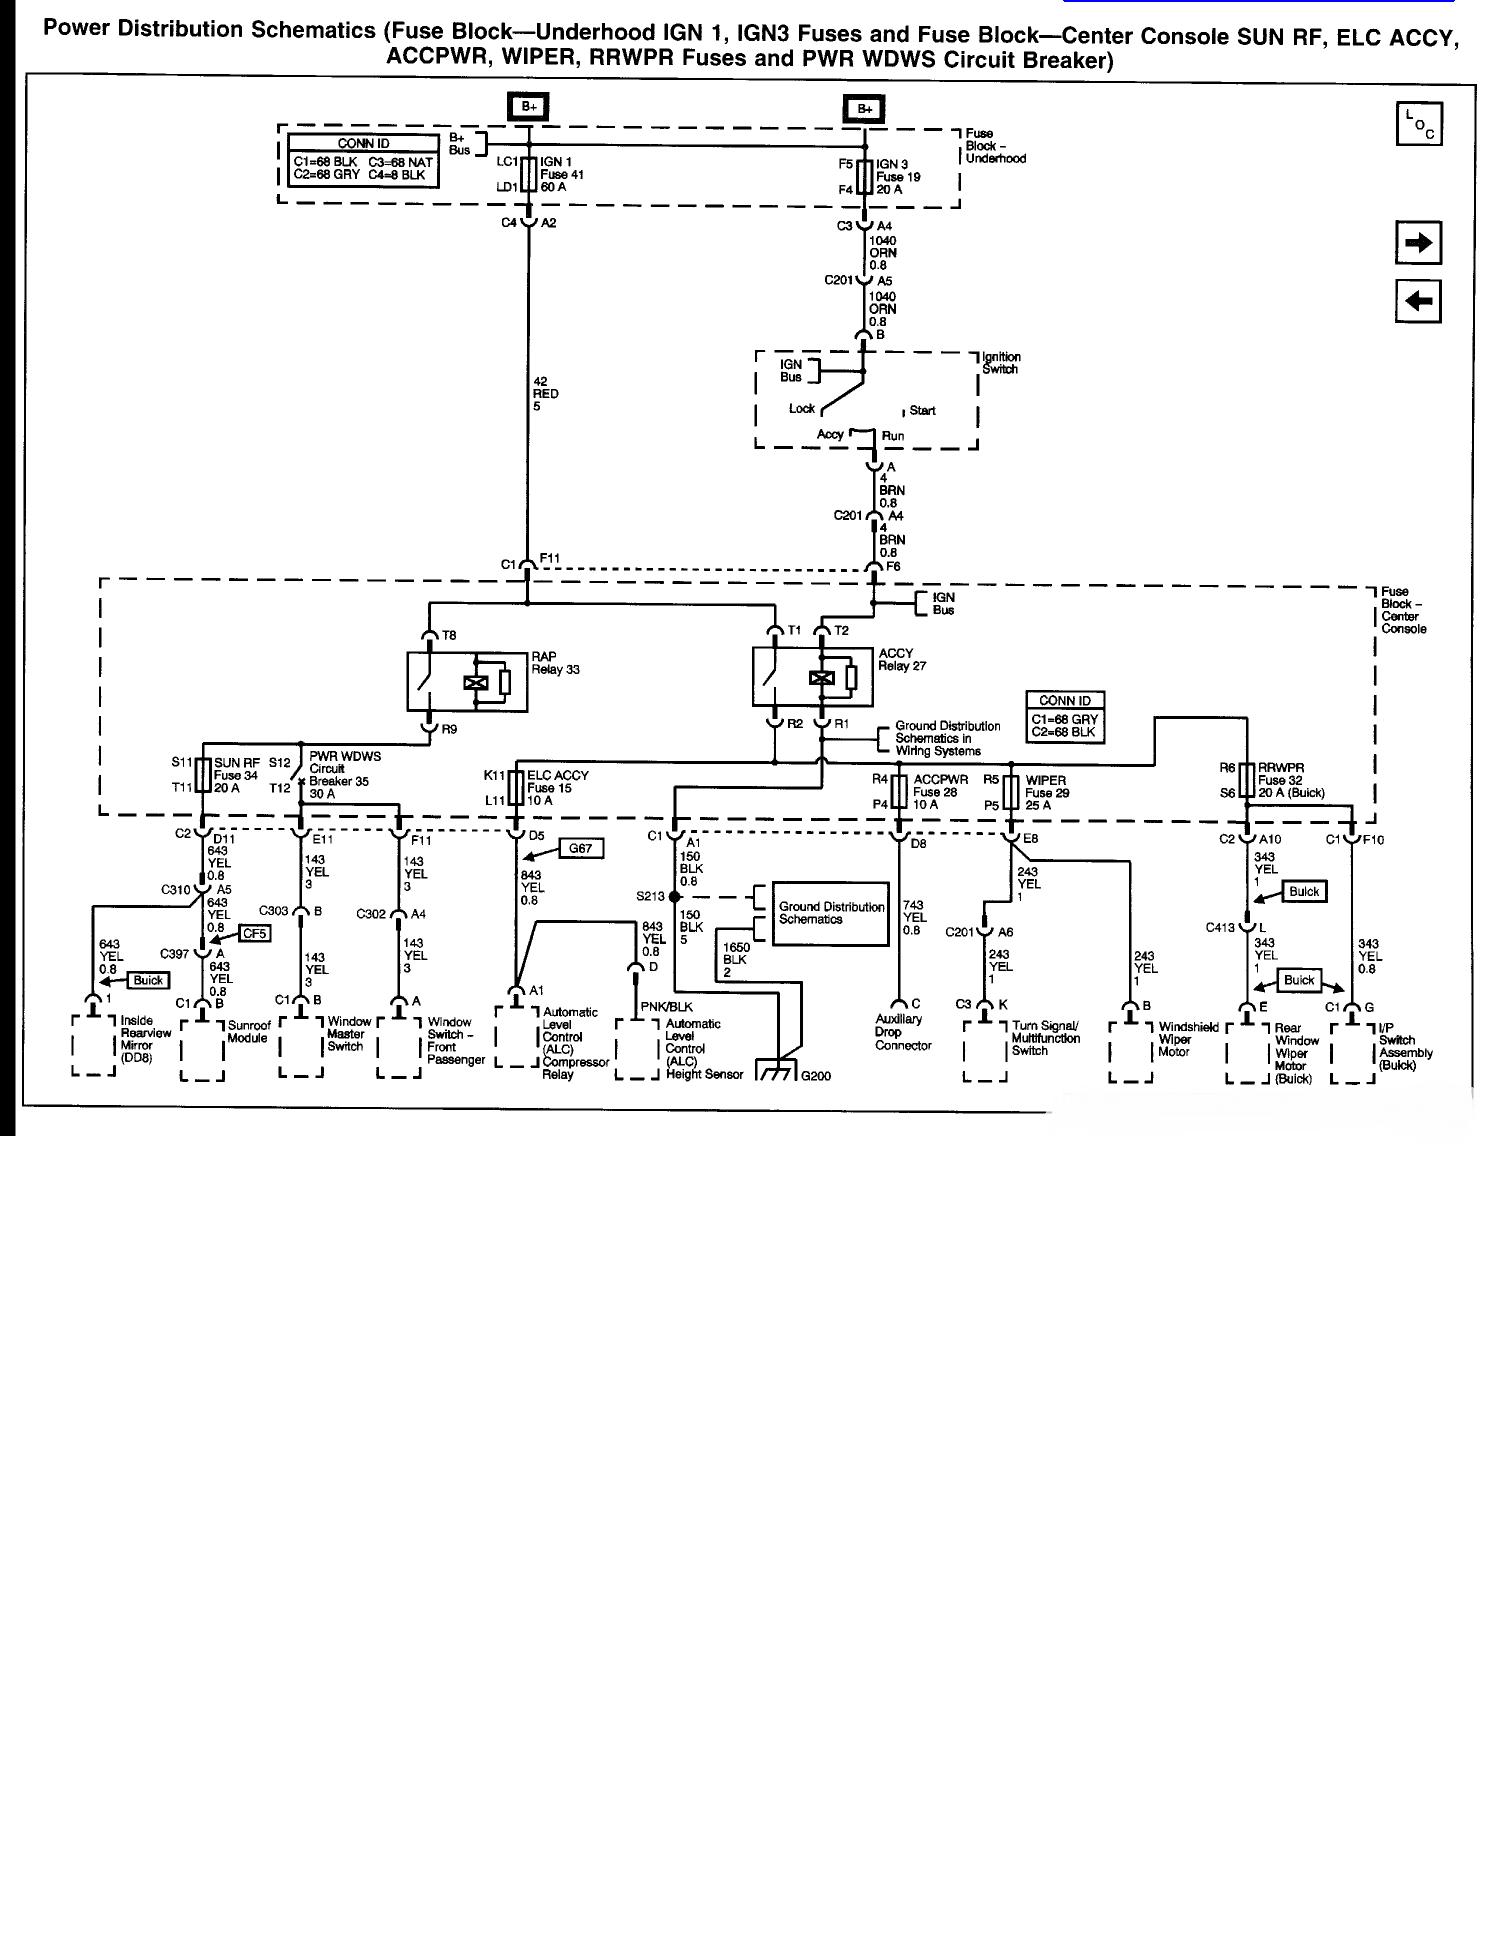 Diagram 72 Buick Ignition Switch Wiring Diagram Full Version Hd Quality Wiring Diagram Diagramsernae Gisbertovalori It